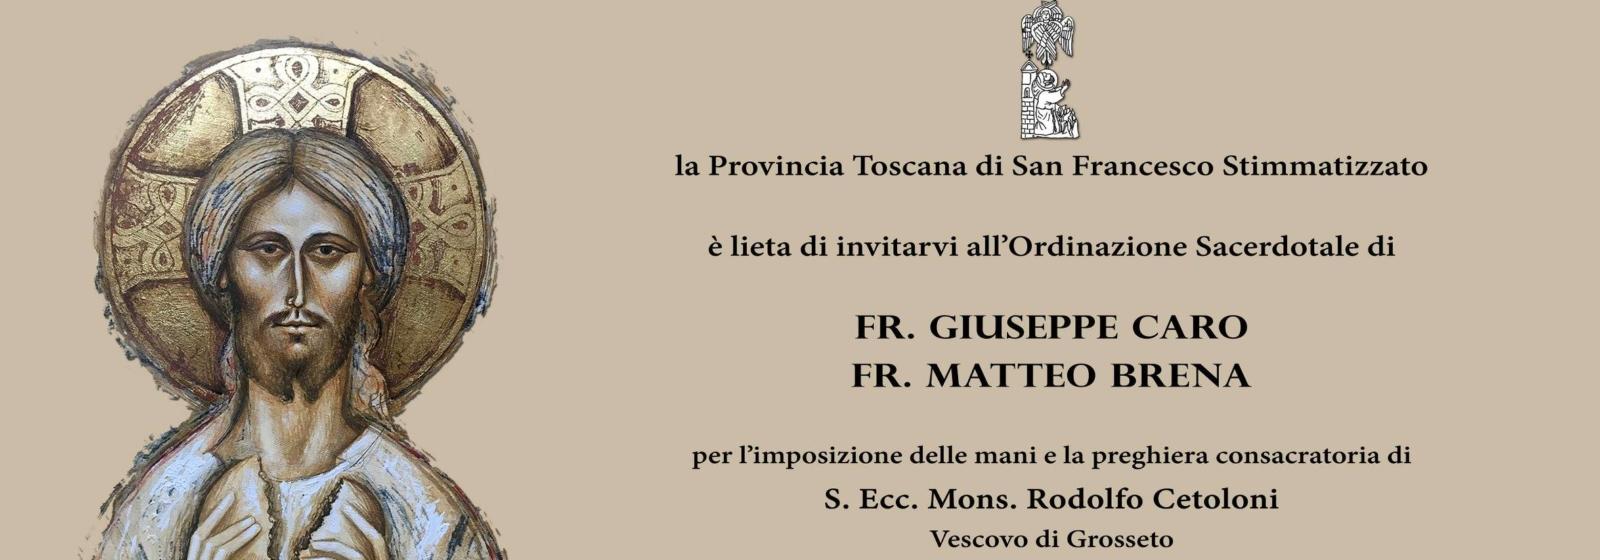 Ordinazione Sacerdotale di fra Giuseppe Caro e fra Matteo Brena